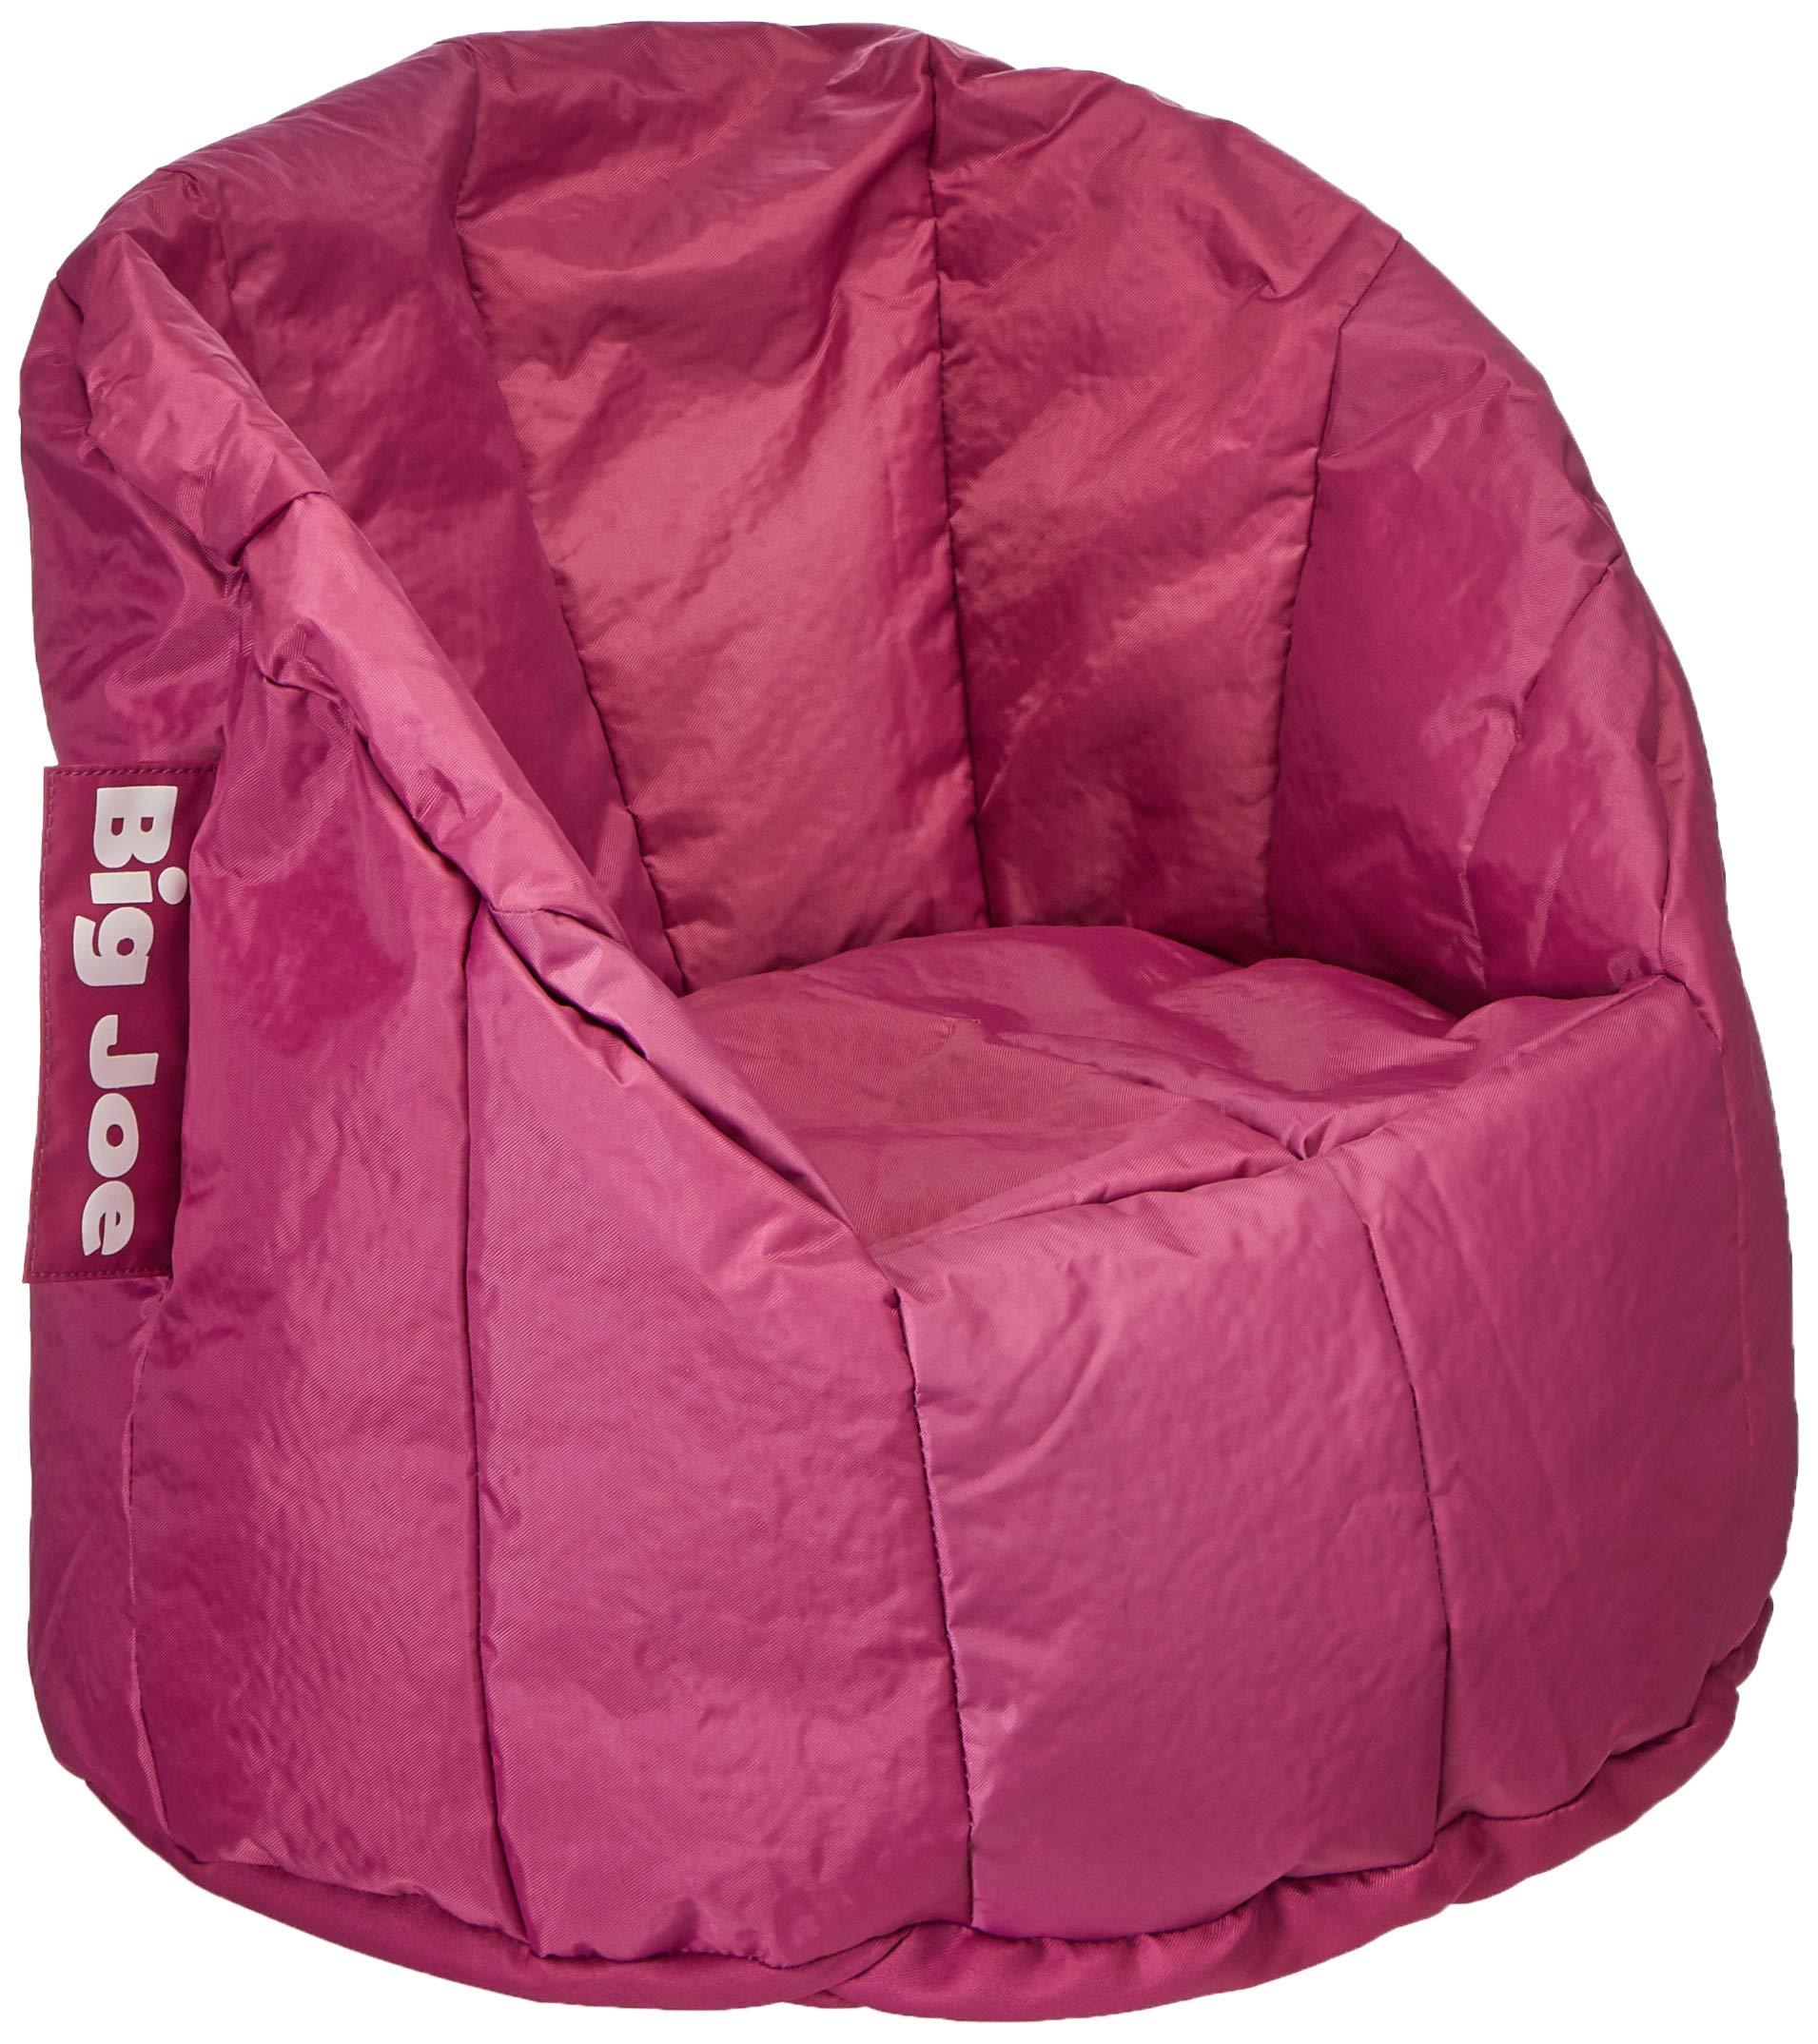 Big Joe 0653610 Kids Lumin Pink Passion SmartMax, One Size by Big Joe